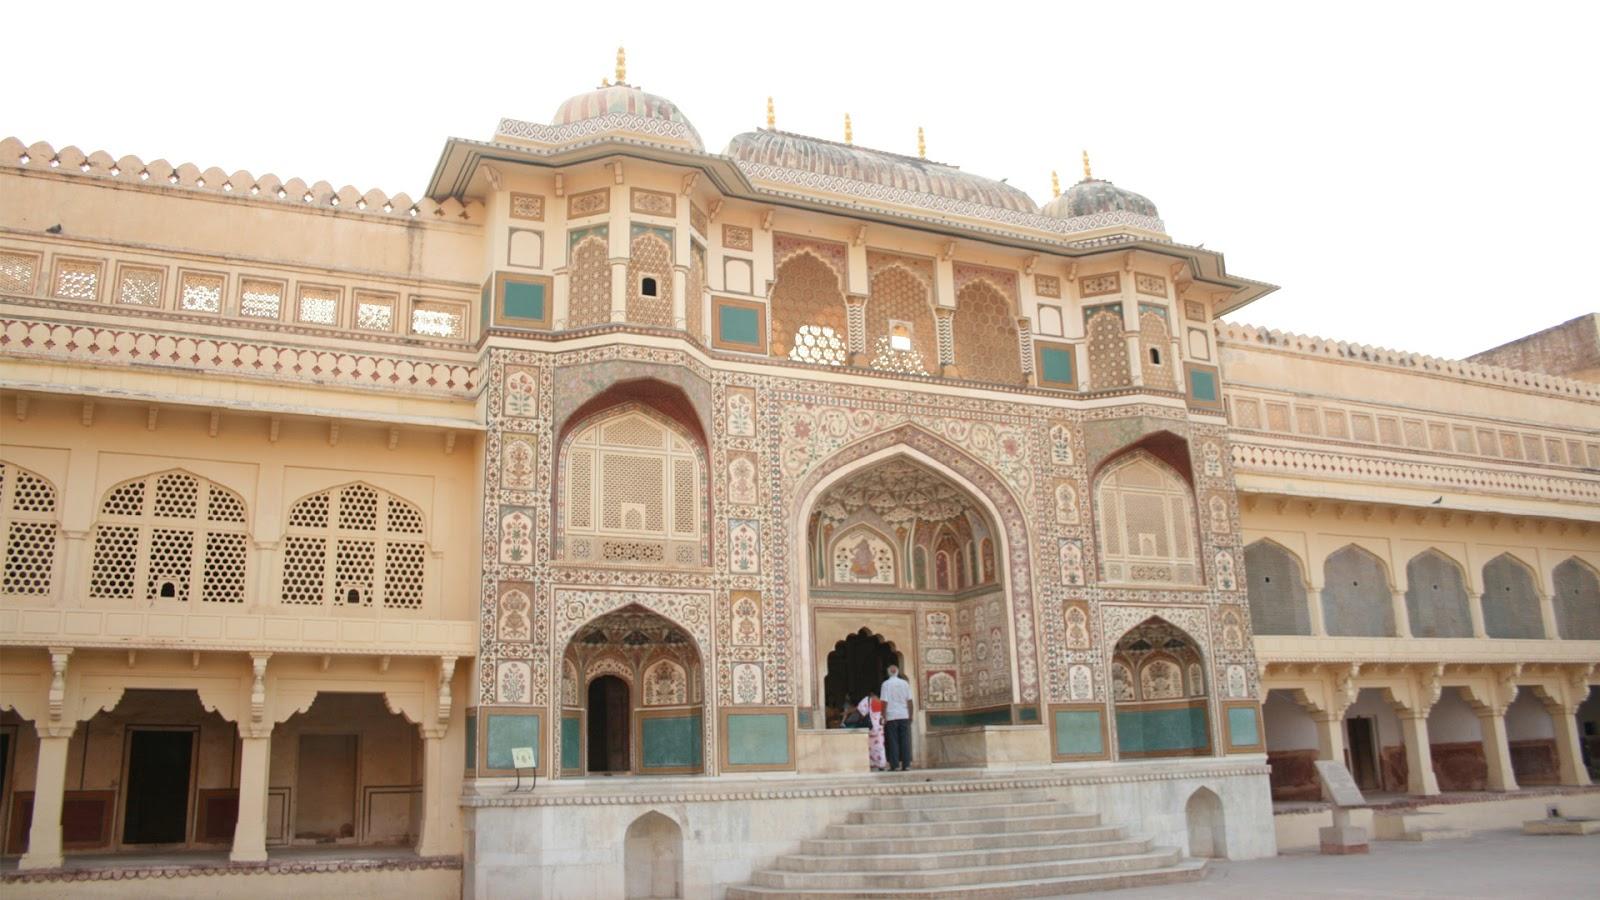 Jaipur Full Hd Wallpapers 1080p Hd Wallpapers High